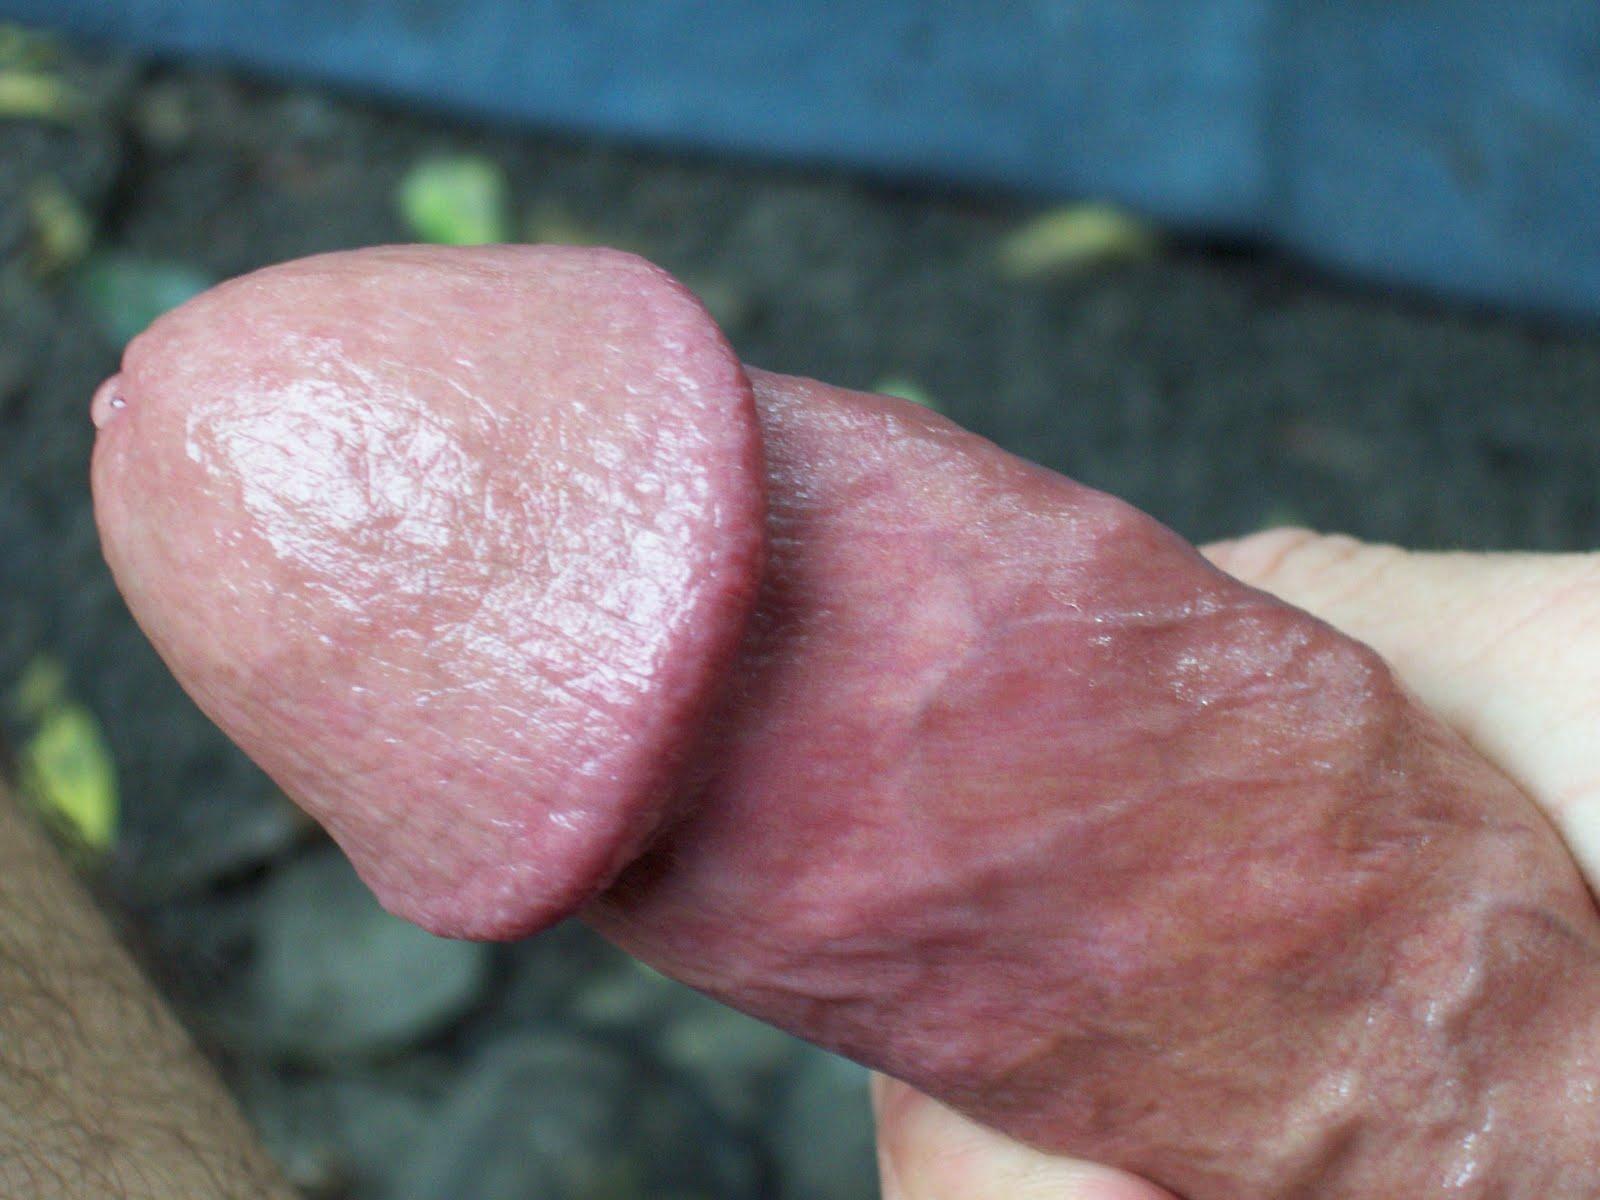 The ass, Addiction endorphins masturbation